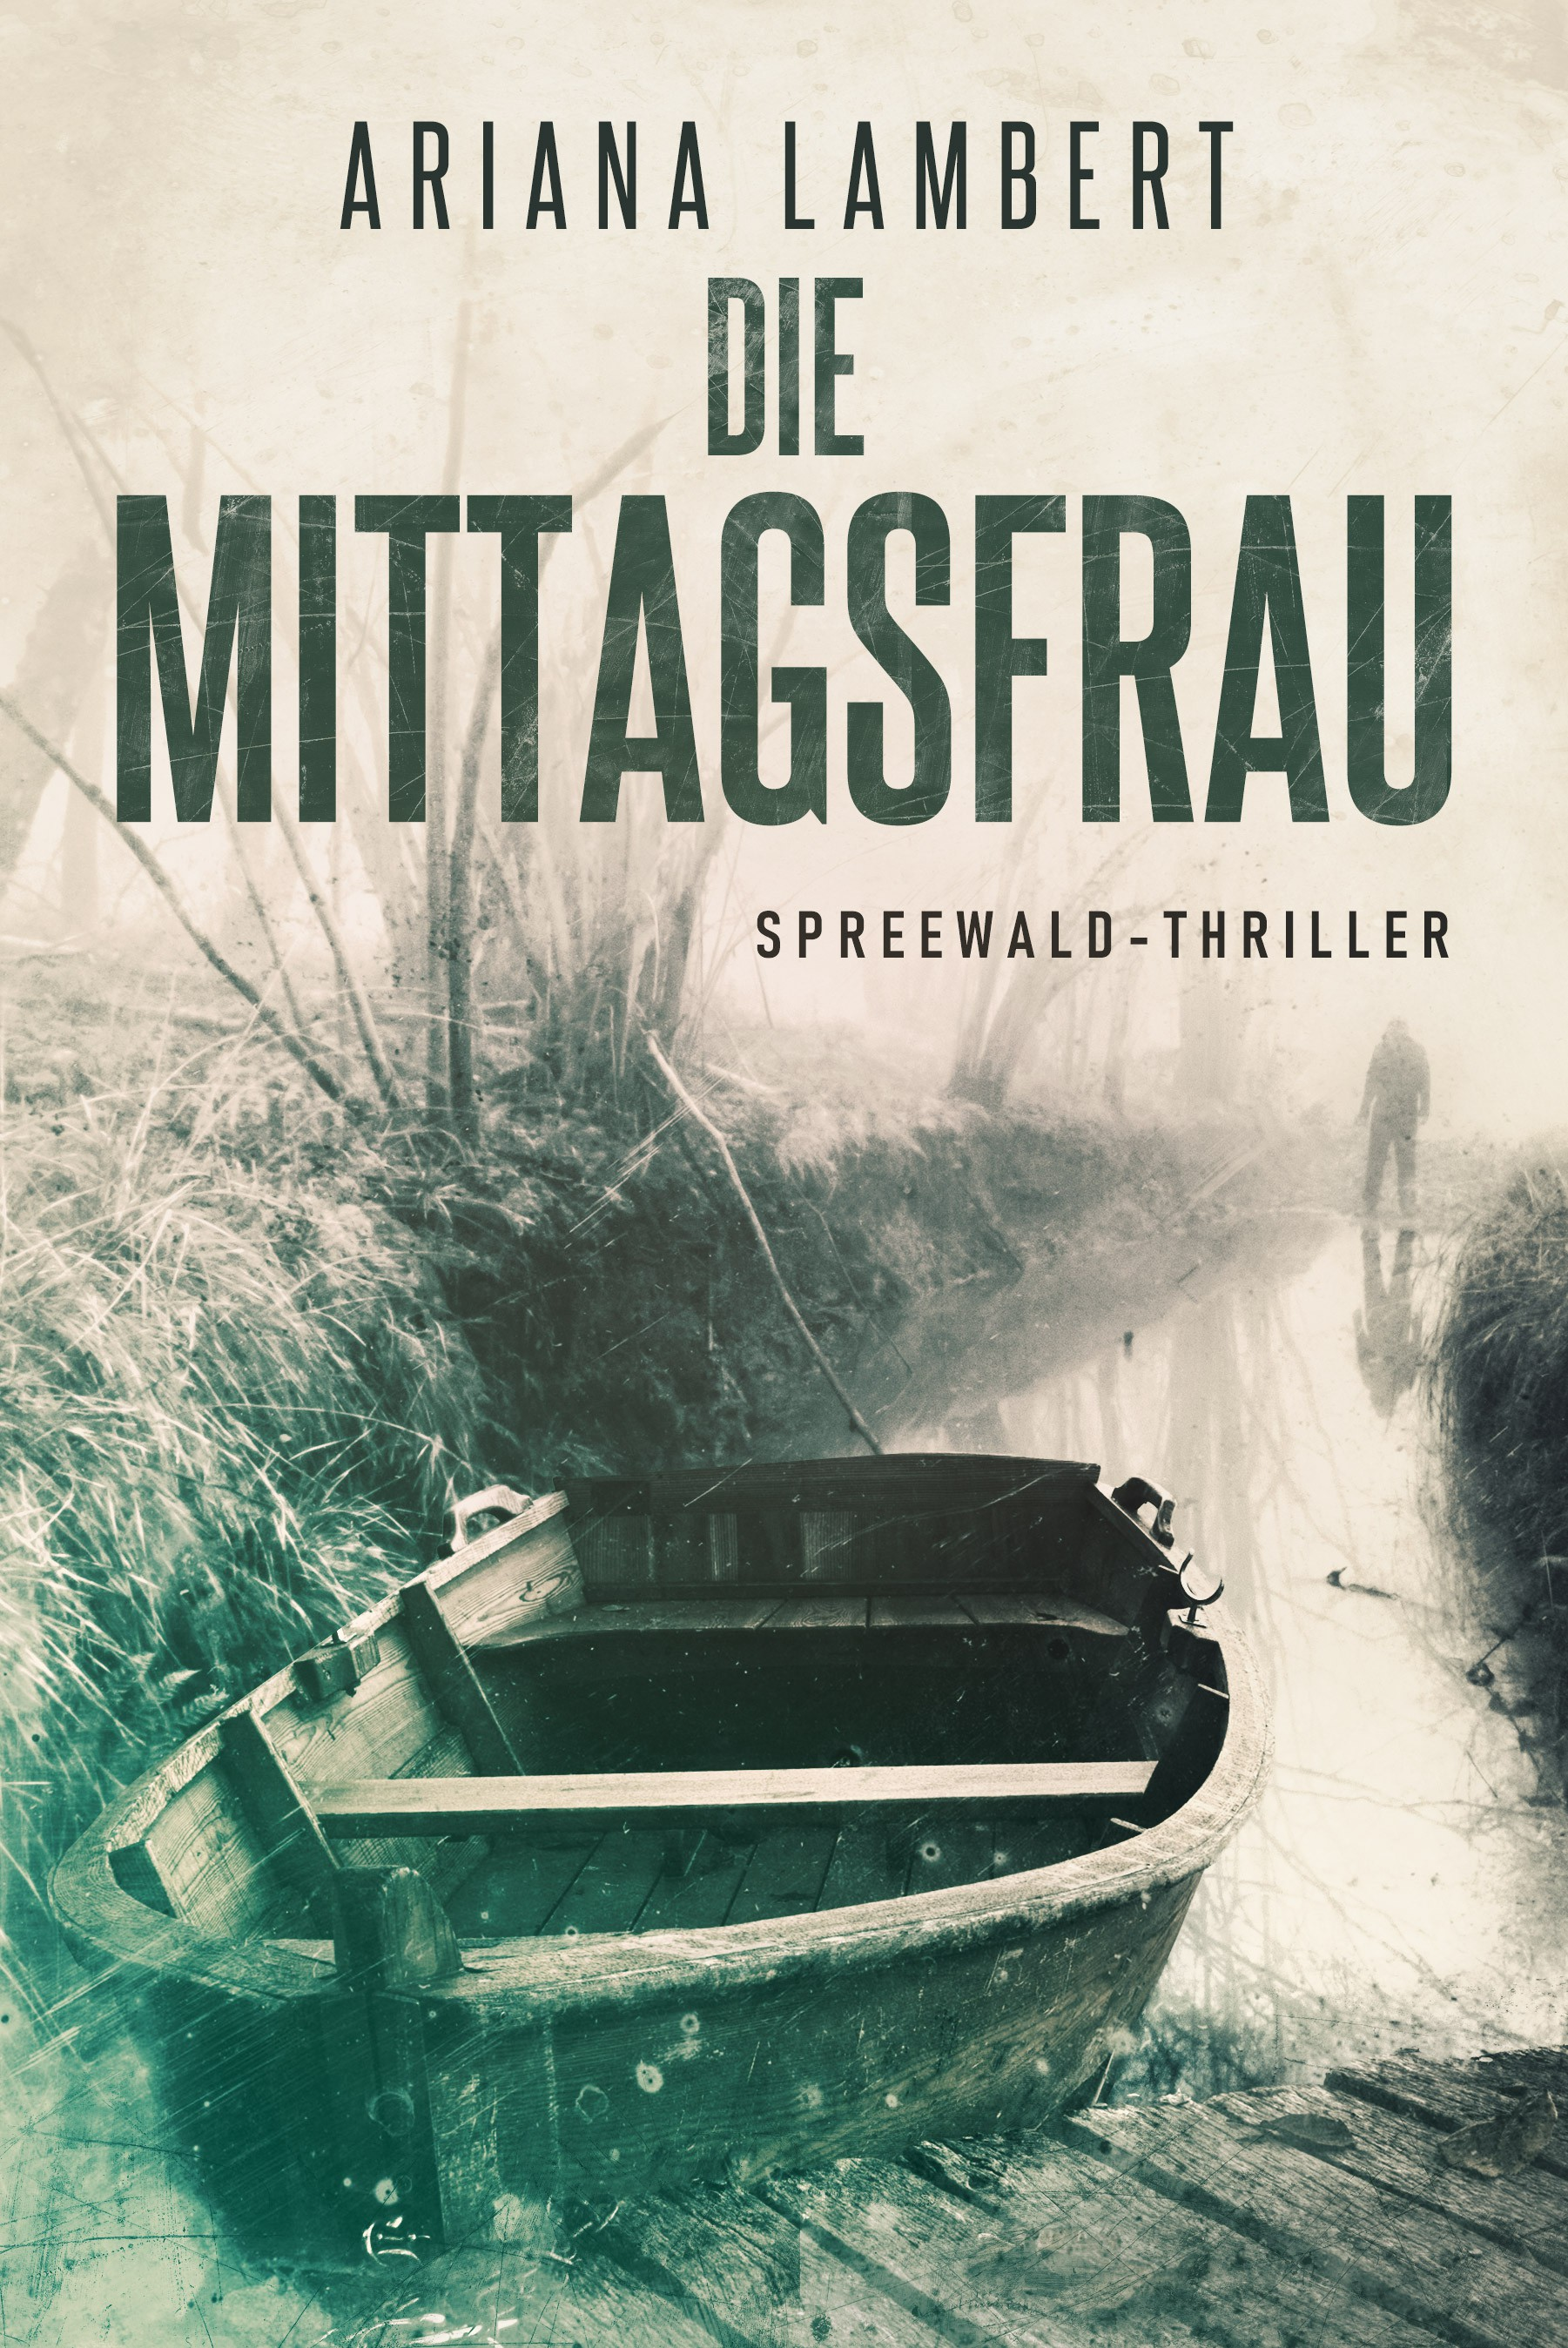 Spreewald-Thriller